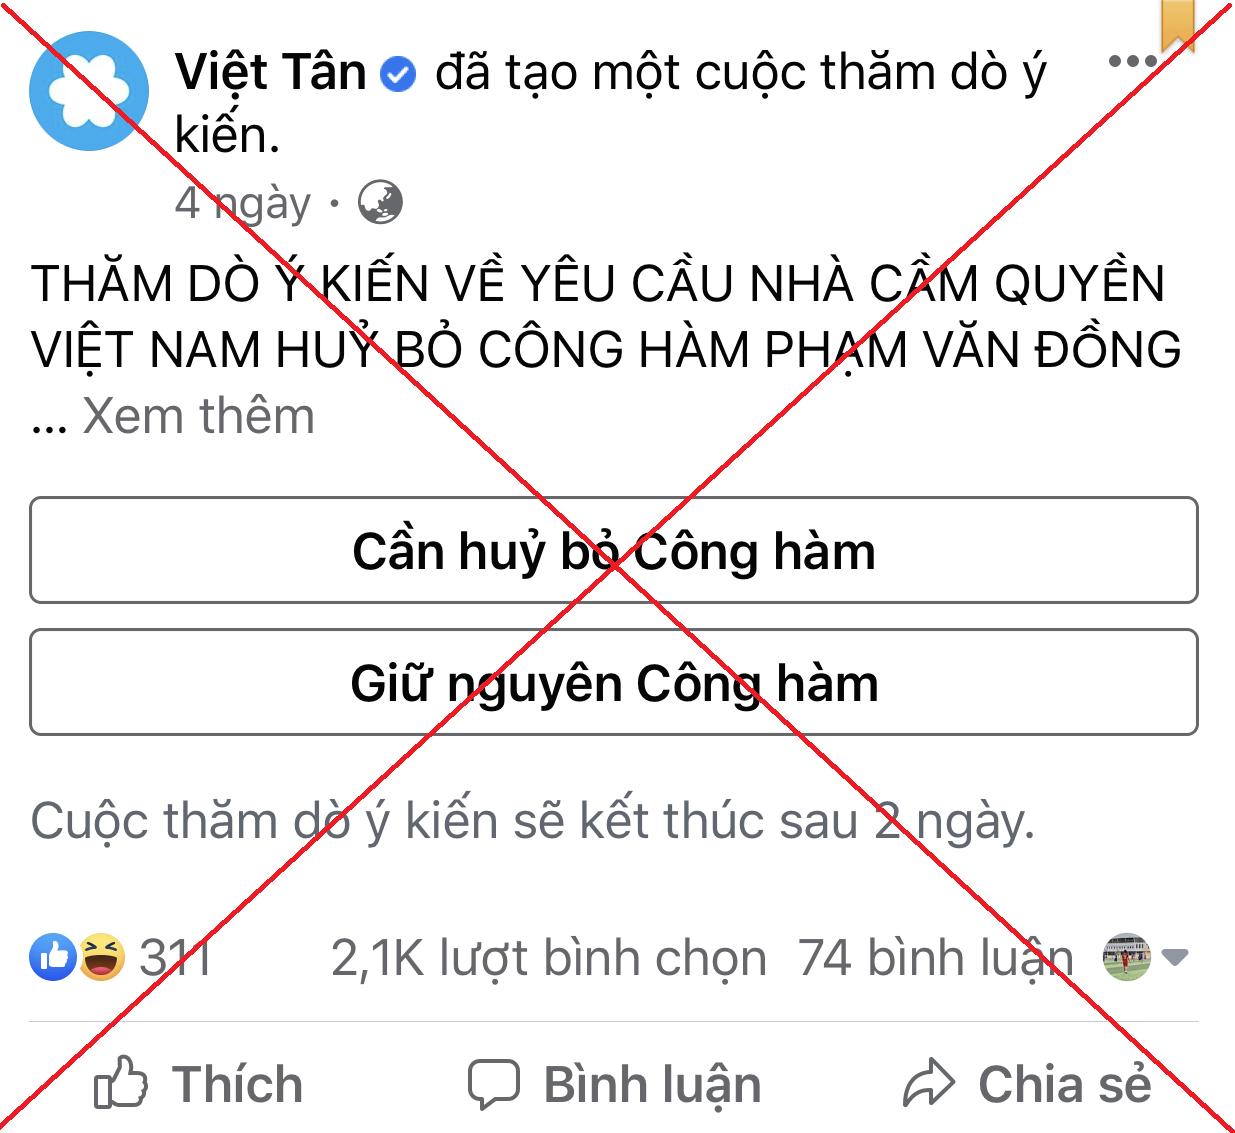 C:\Users\THANH HAI\Desktop\IMG_0628.PNG